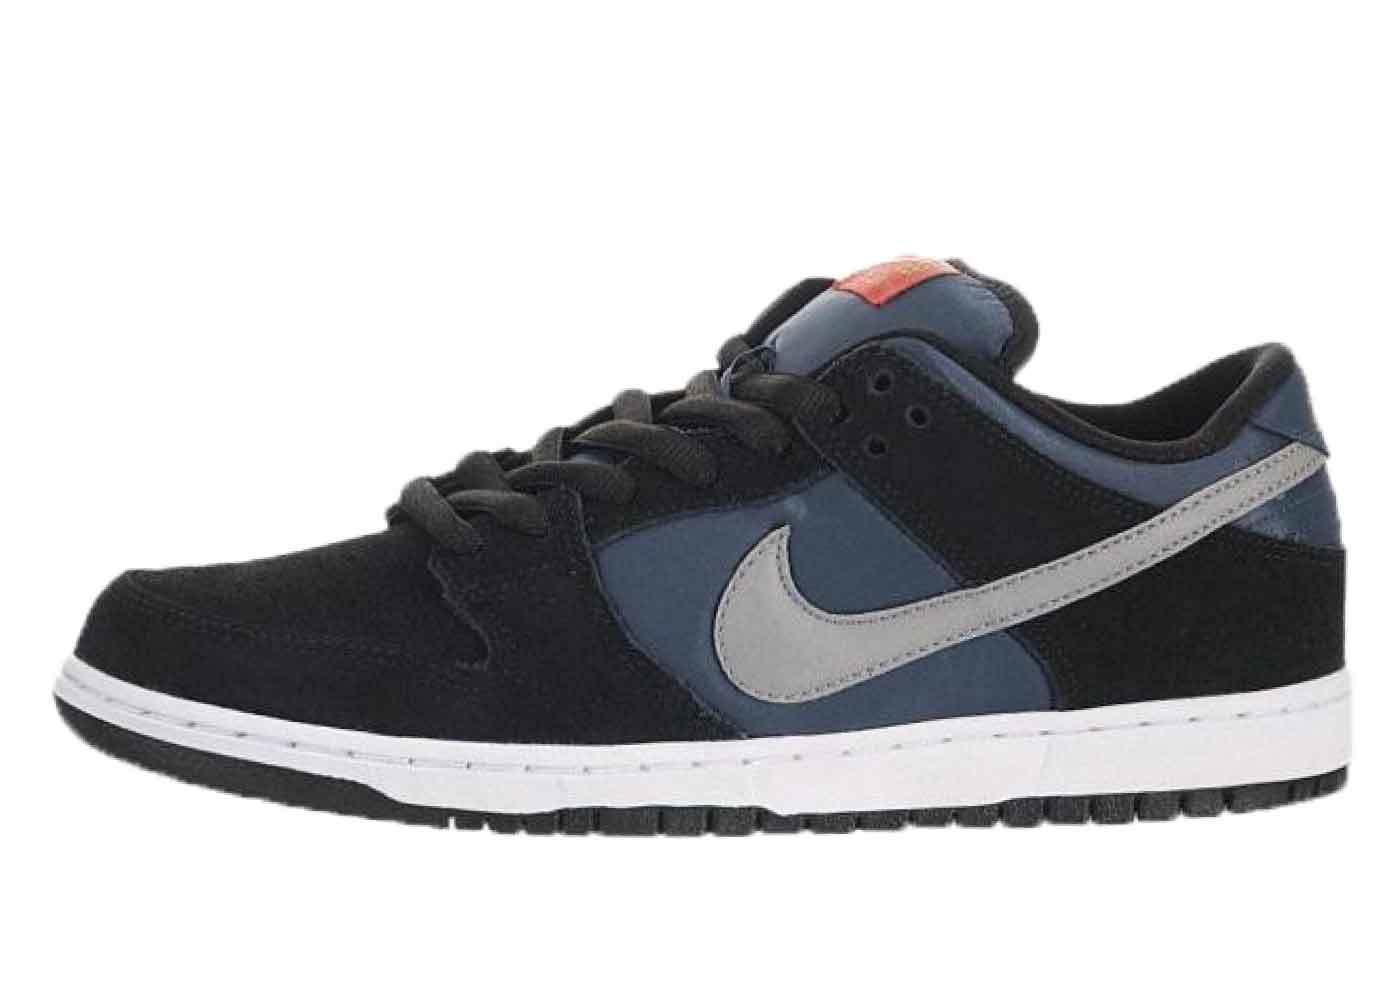 Nike SB Dunk Low Black New Slateの写真